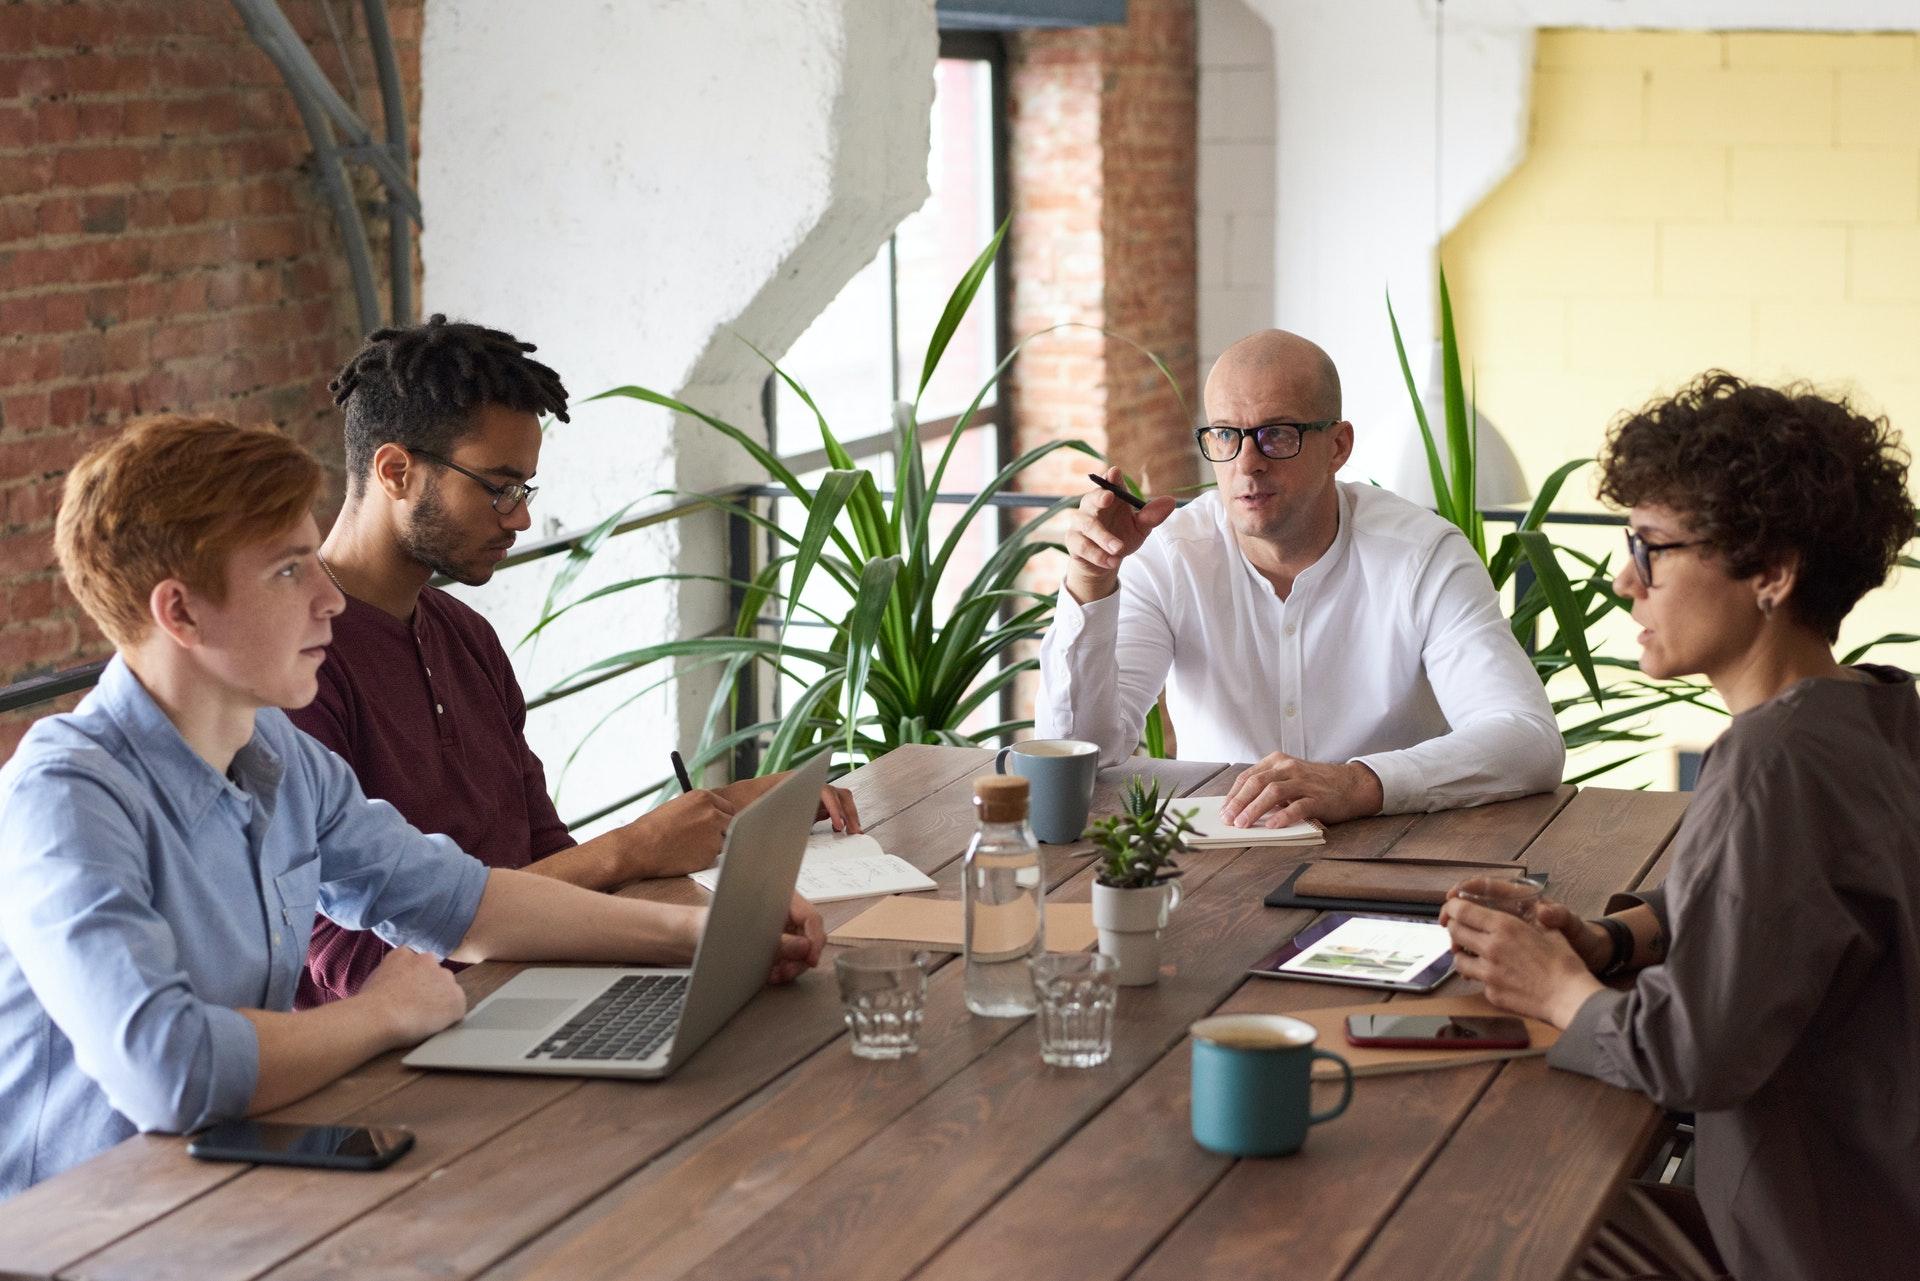 Agile Meeting